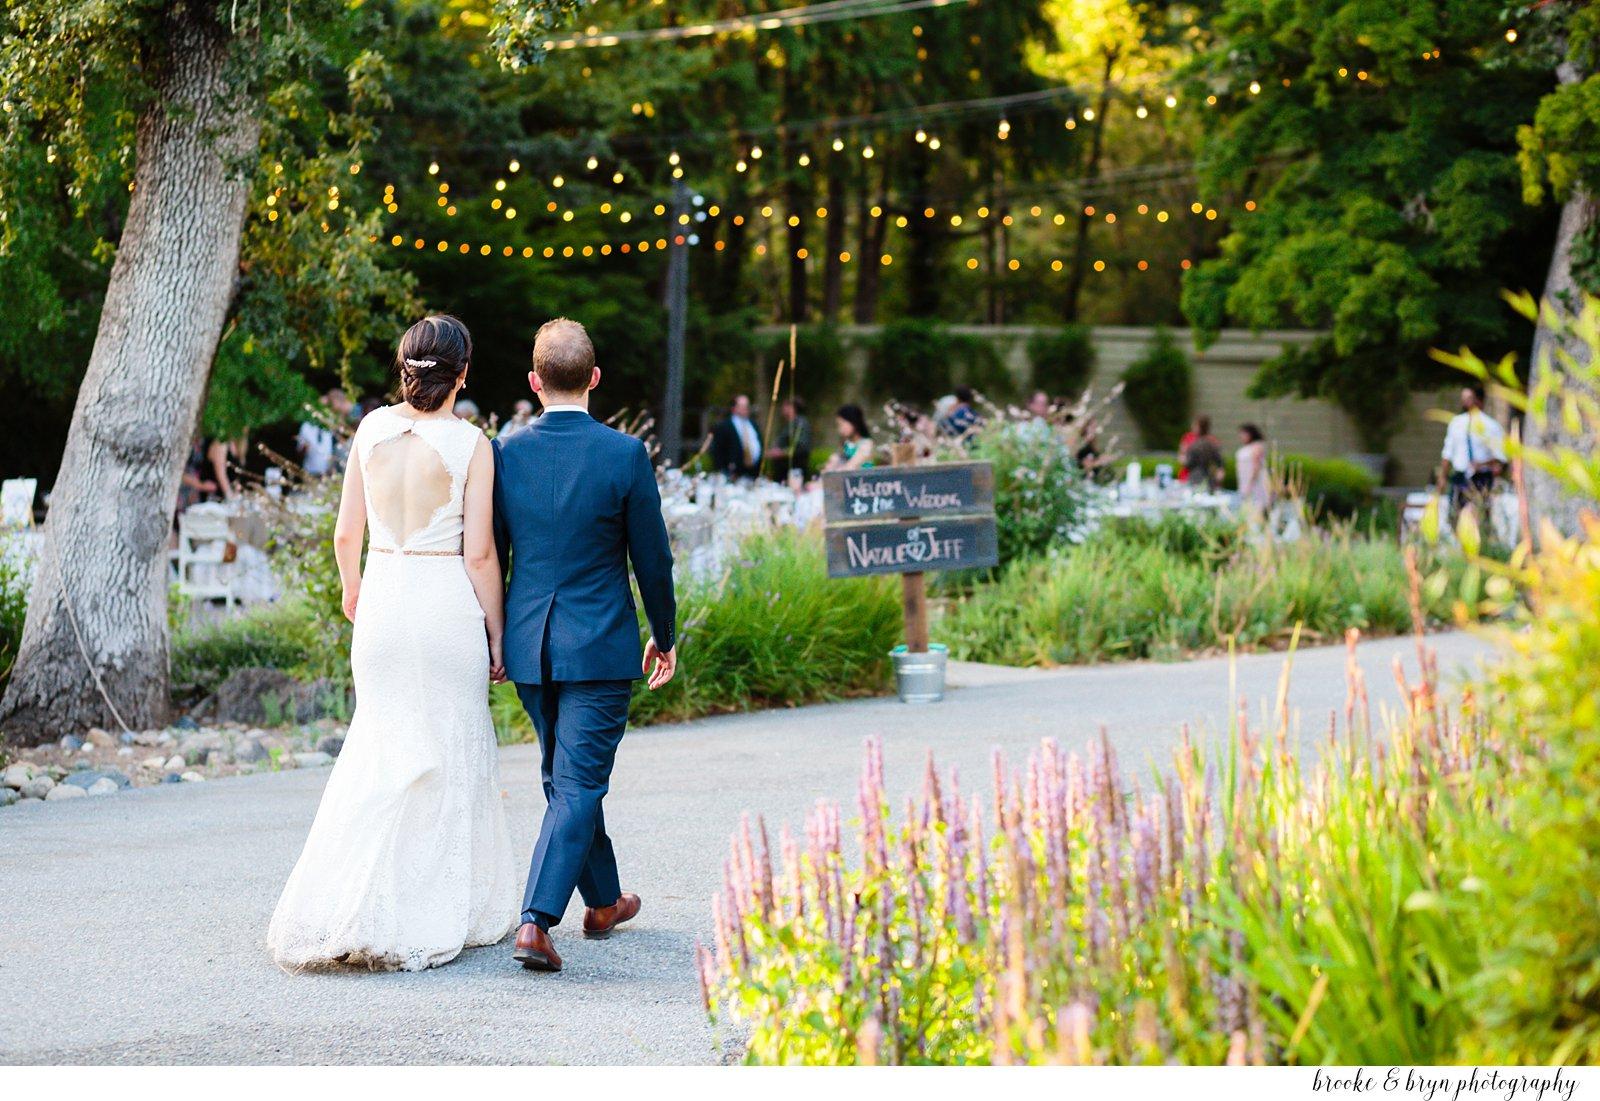 Ravenswood Wedding, Livermore Wedding Photographers, Livermore Wedding, Ravenswood Wedding, Ravenswood Wedding Photographers